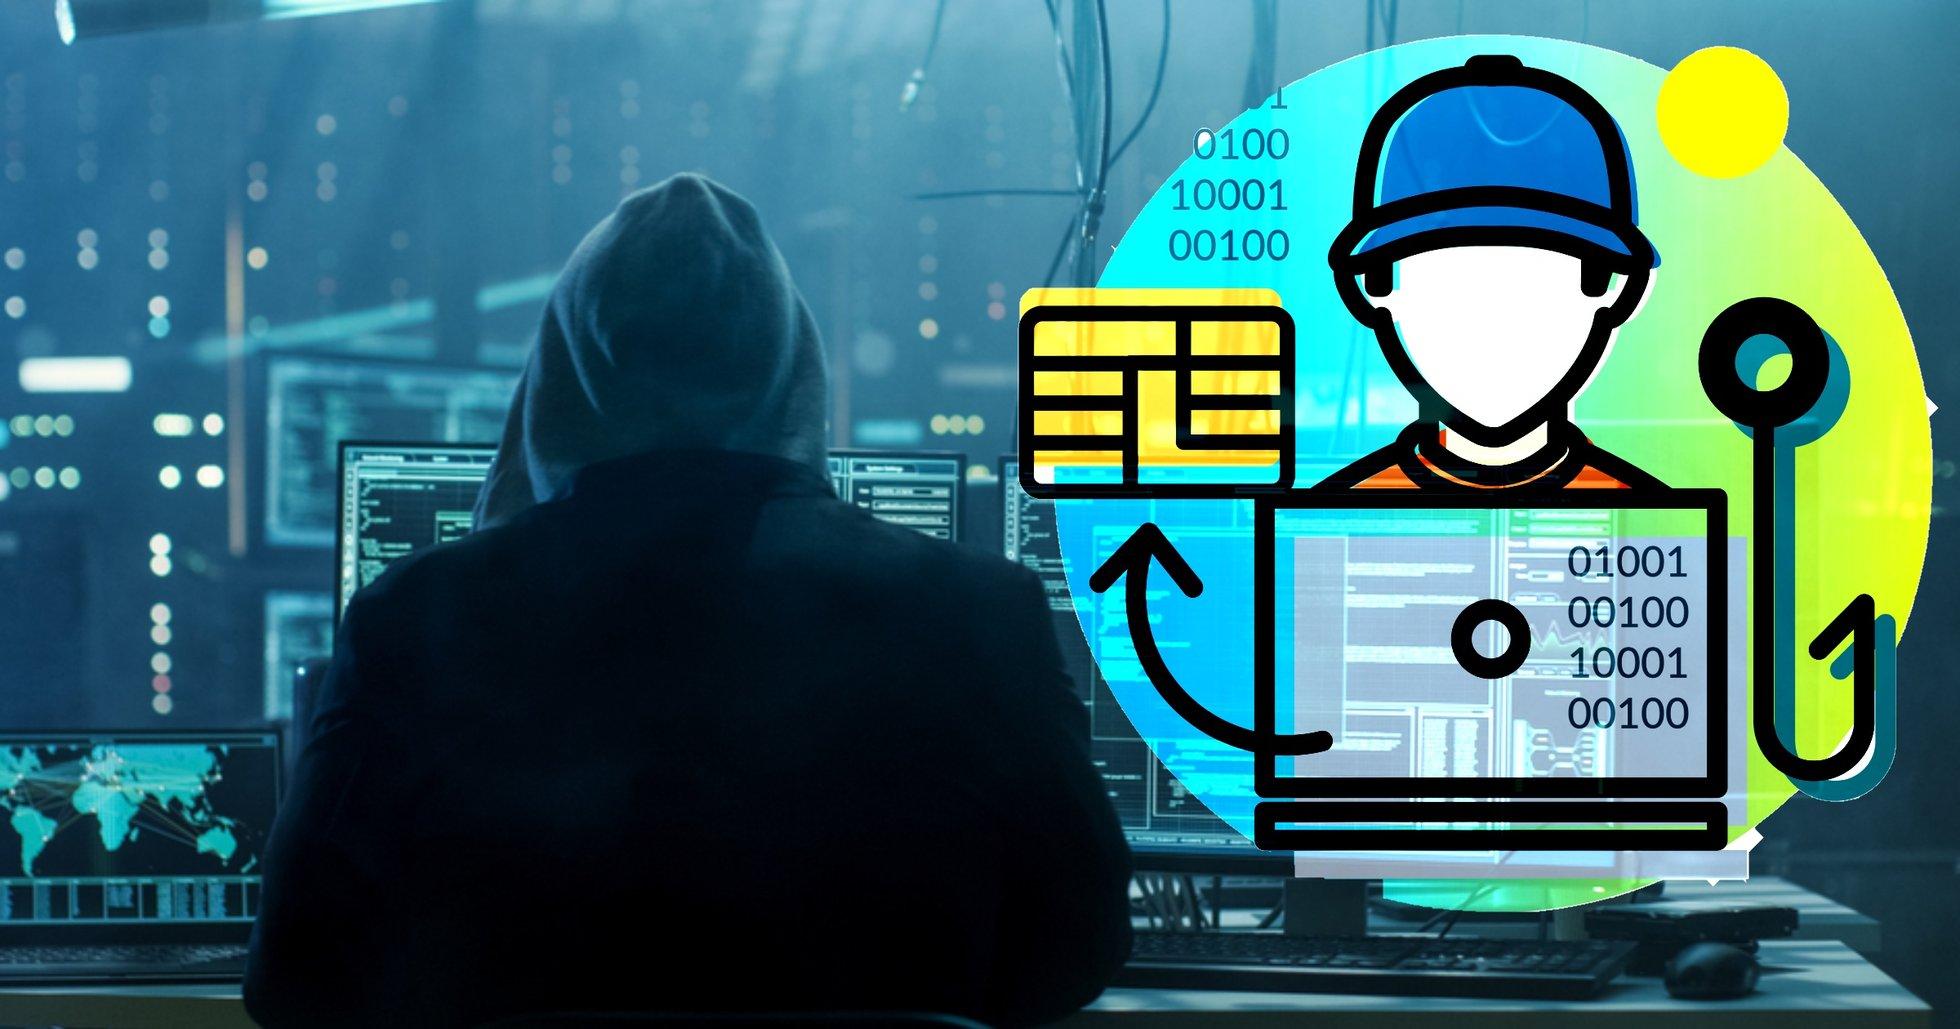 19-åring åtalad – misstänks ha stulit över nio miljoner kronor i kryptovalutor